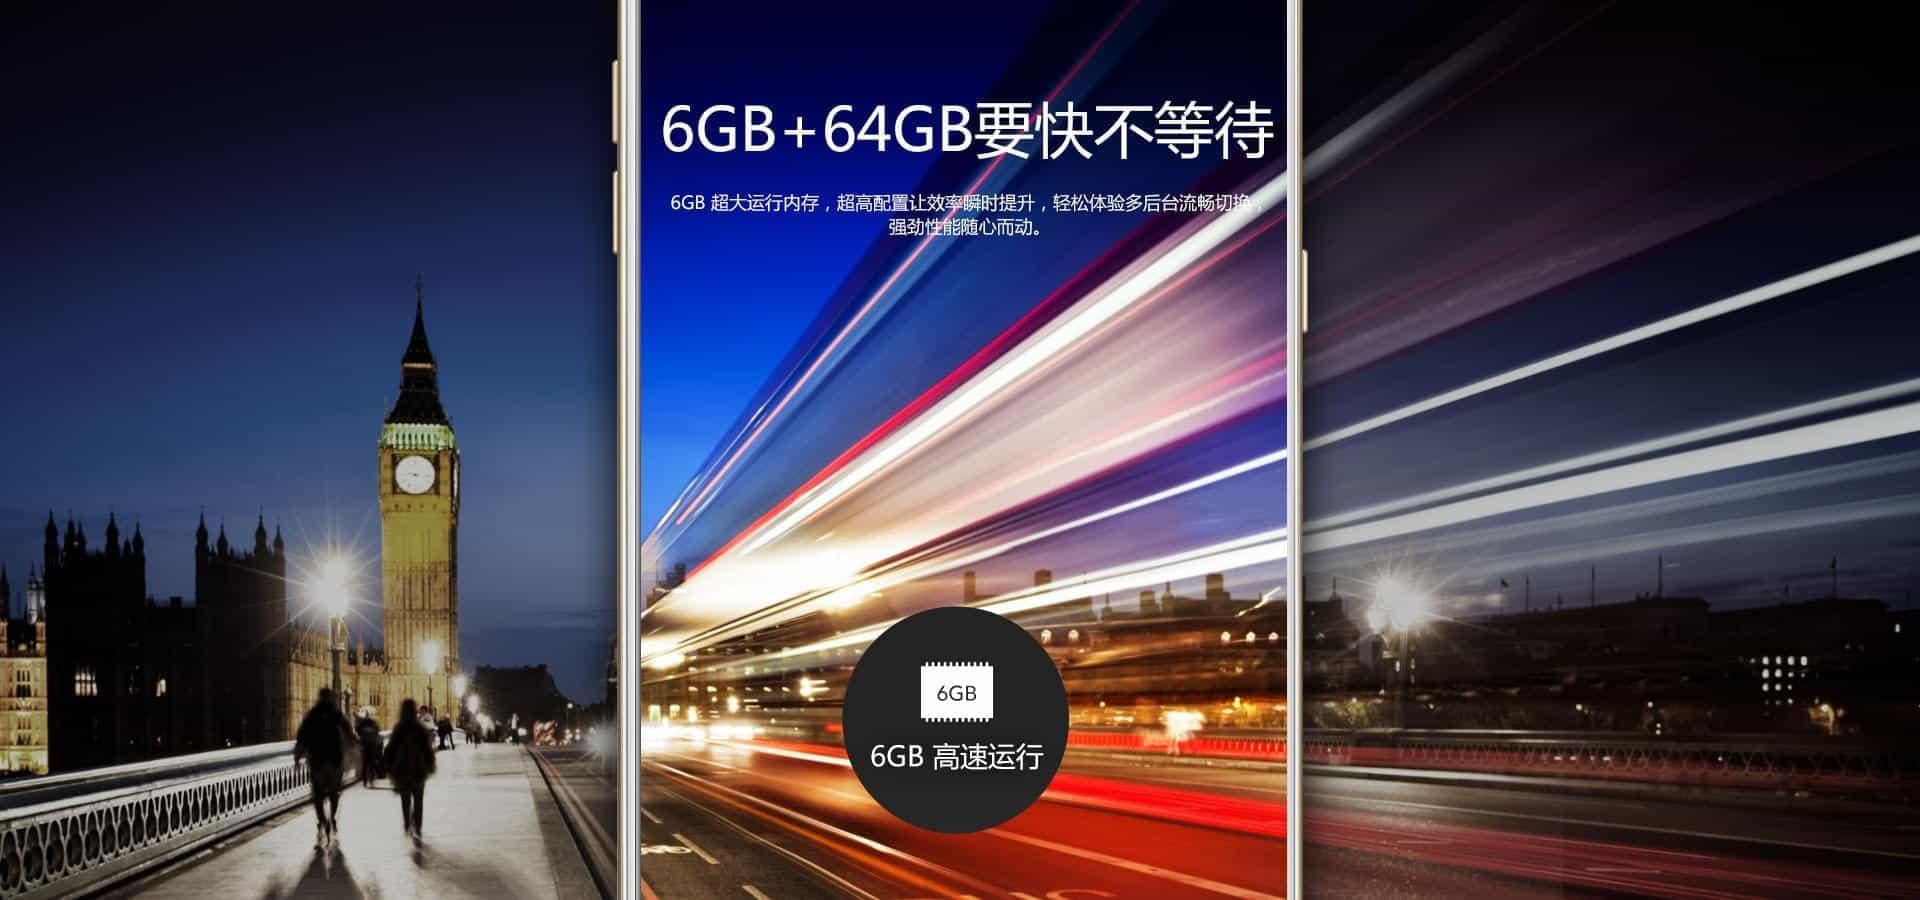 Samsung Galaxy C9 Pro 4